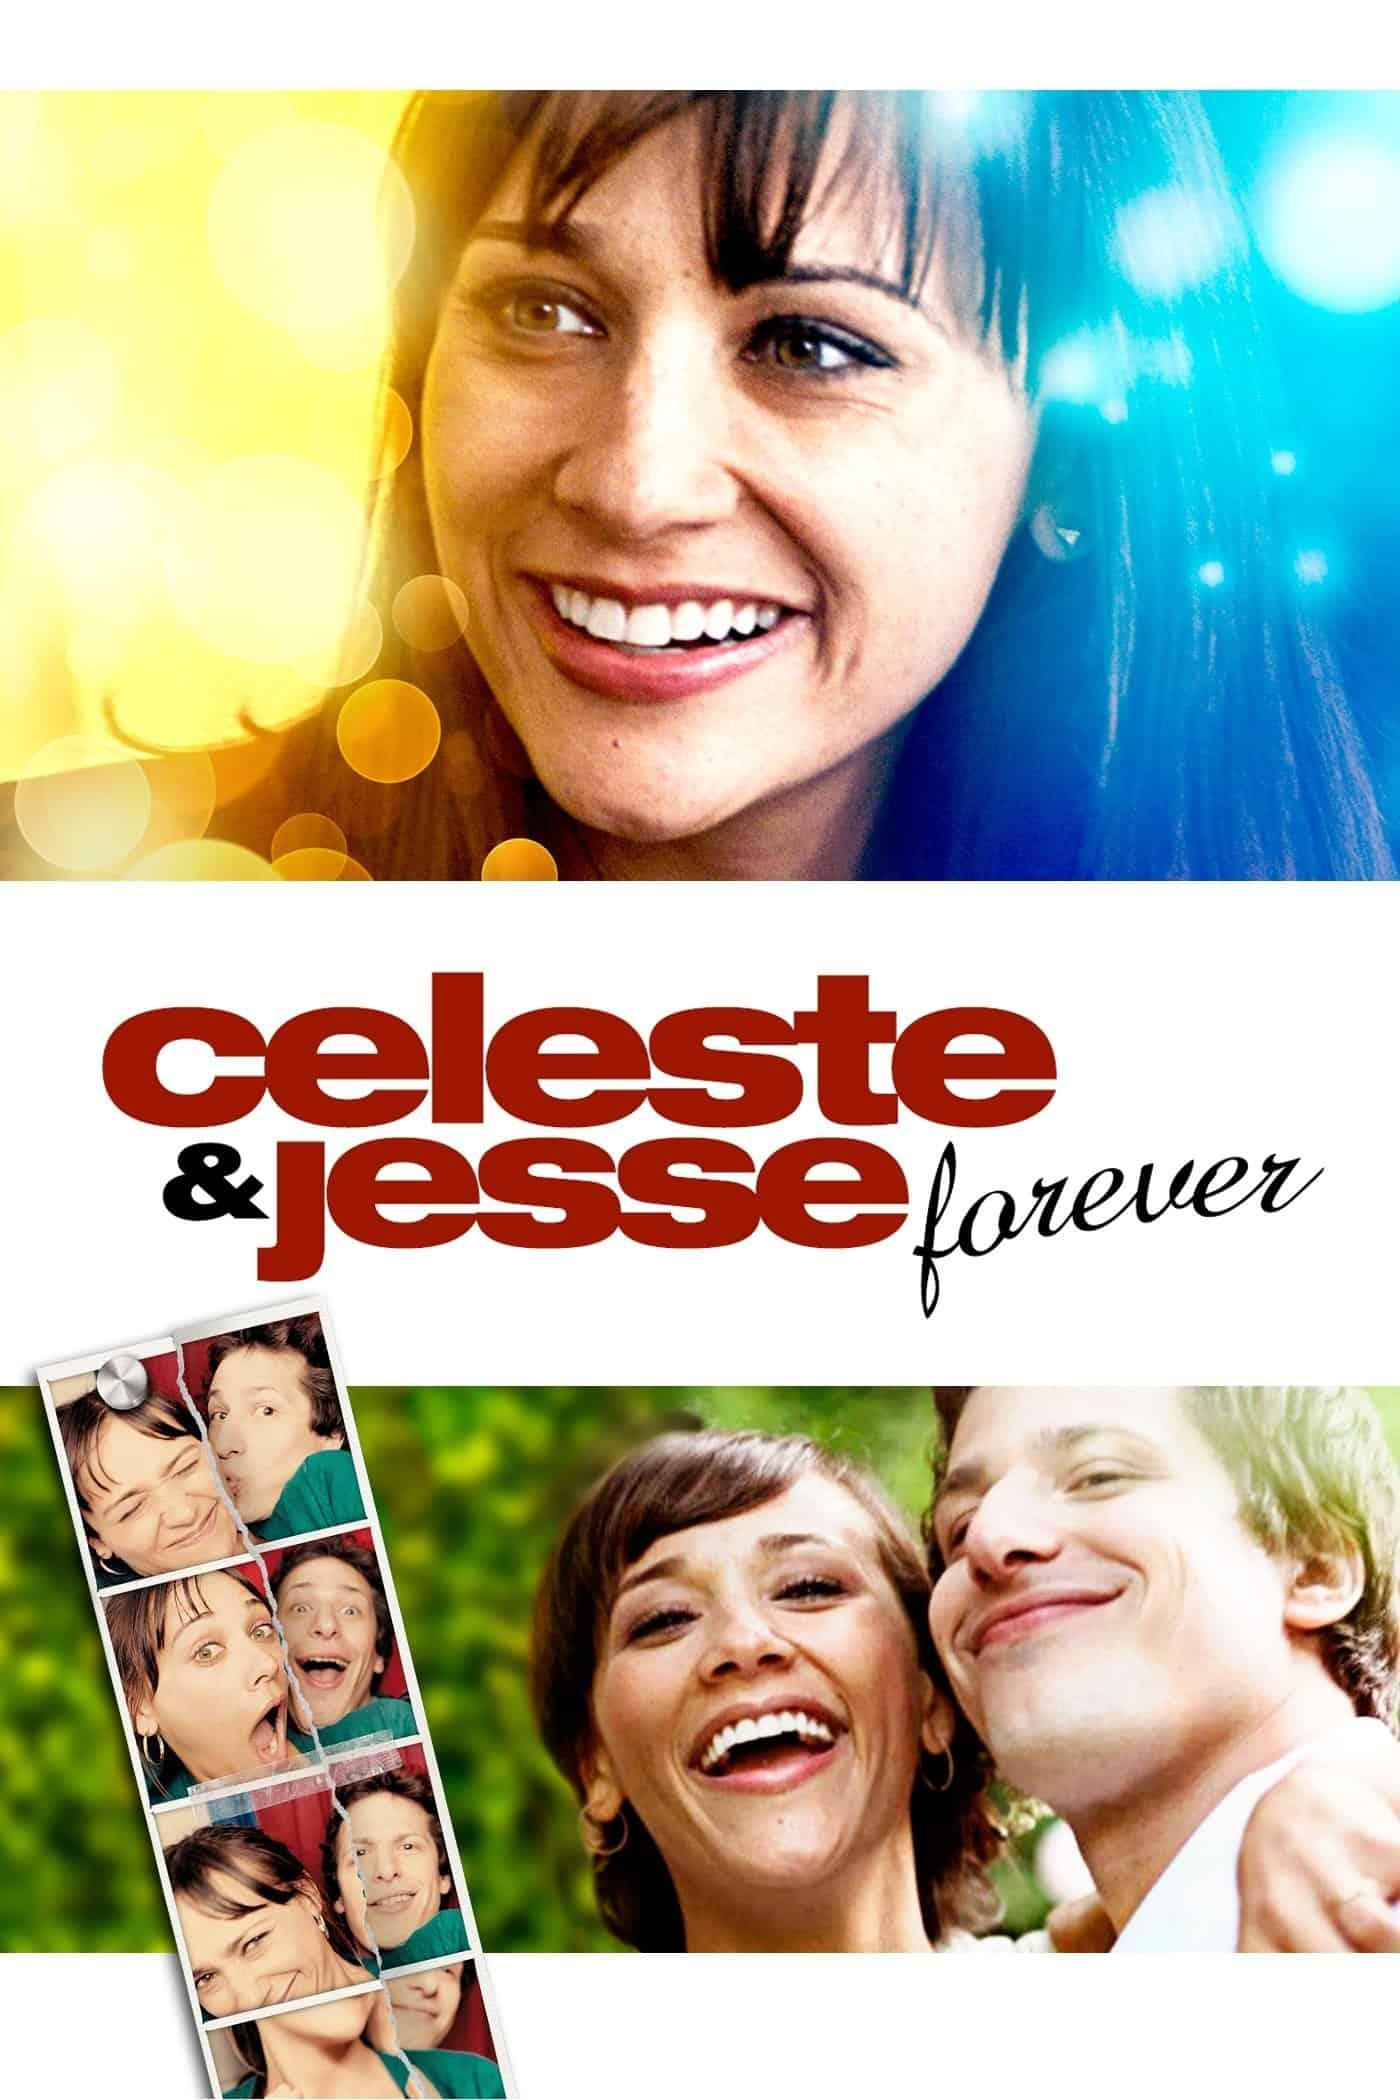 Celeste and Jesse Forever, 2012